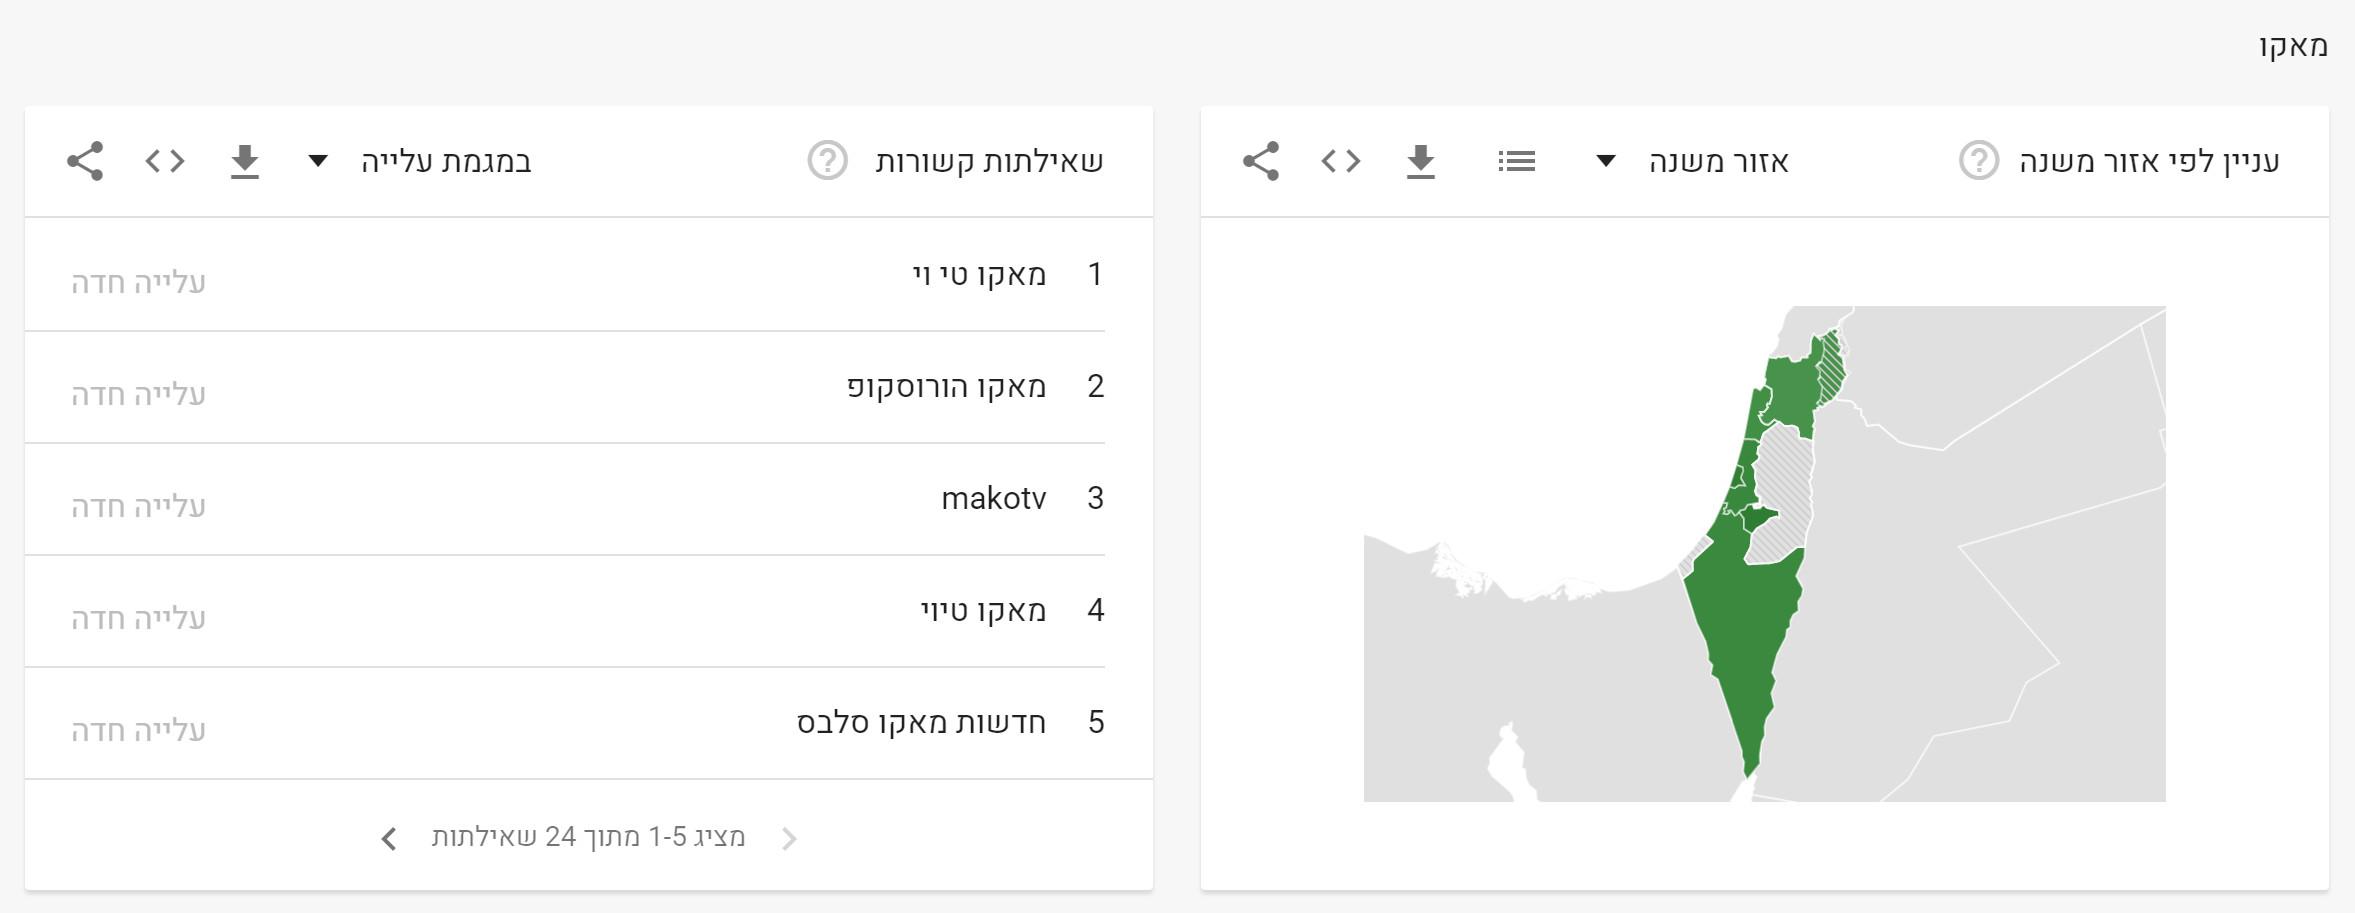 News in Google - Decade (8)